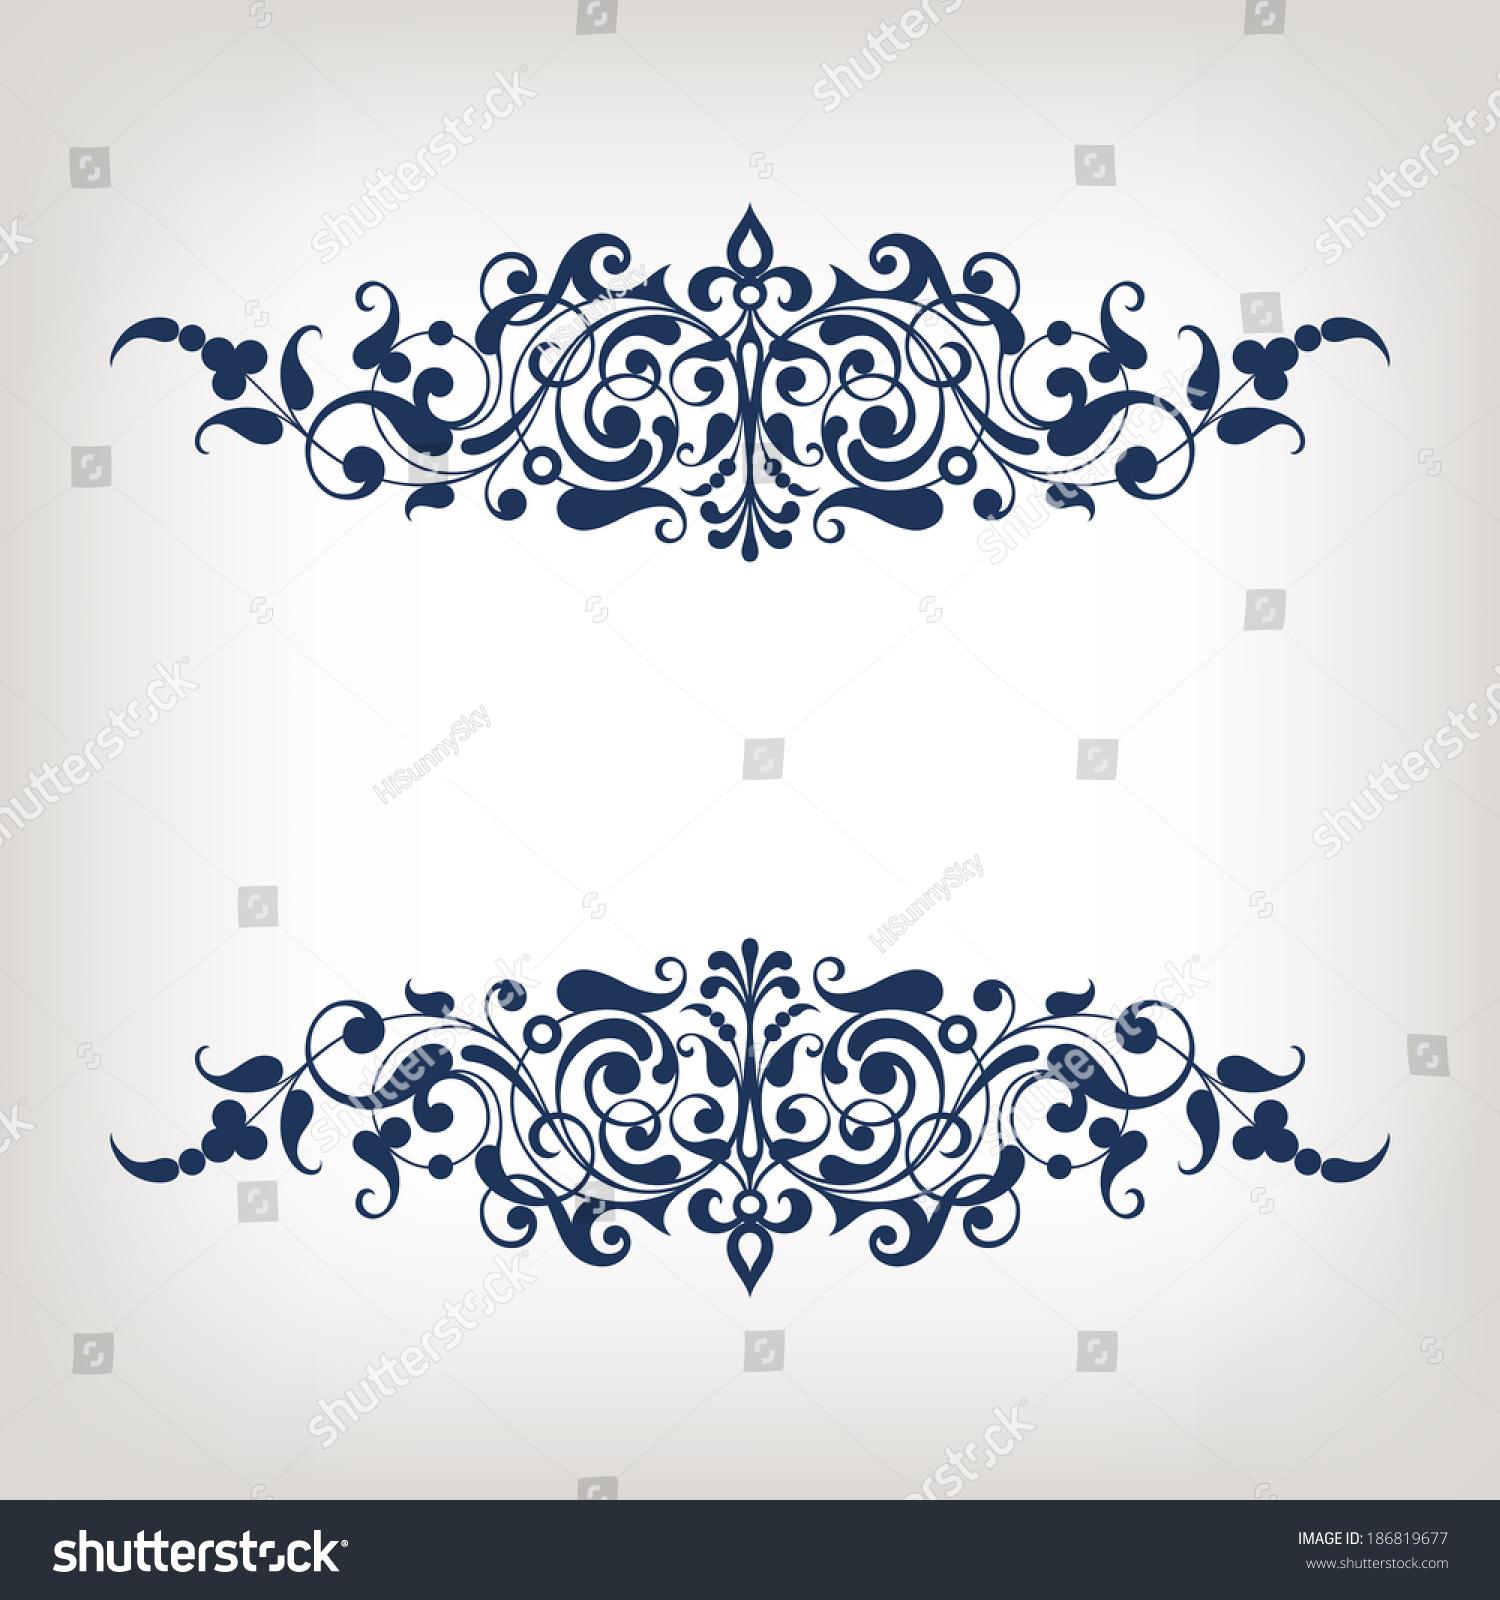 Adha-Al-Mubarak Or Eid-Ul-Azha-Al-Mubarak, Arabic Islamic Calligraphy ...